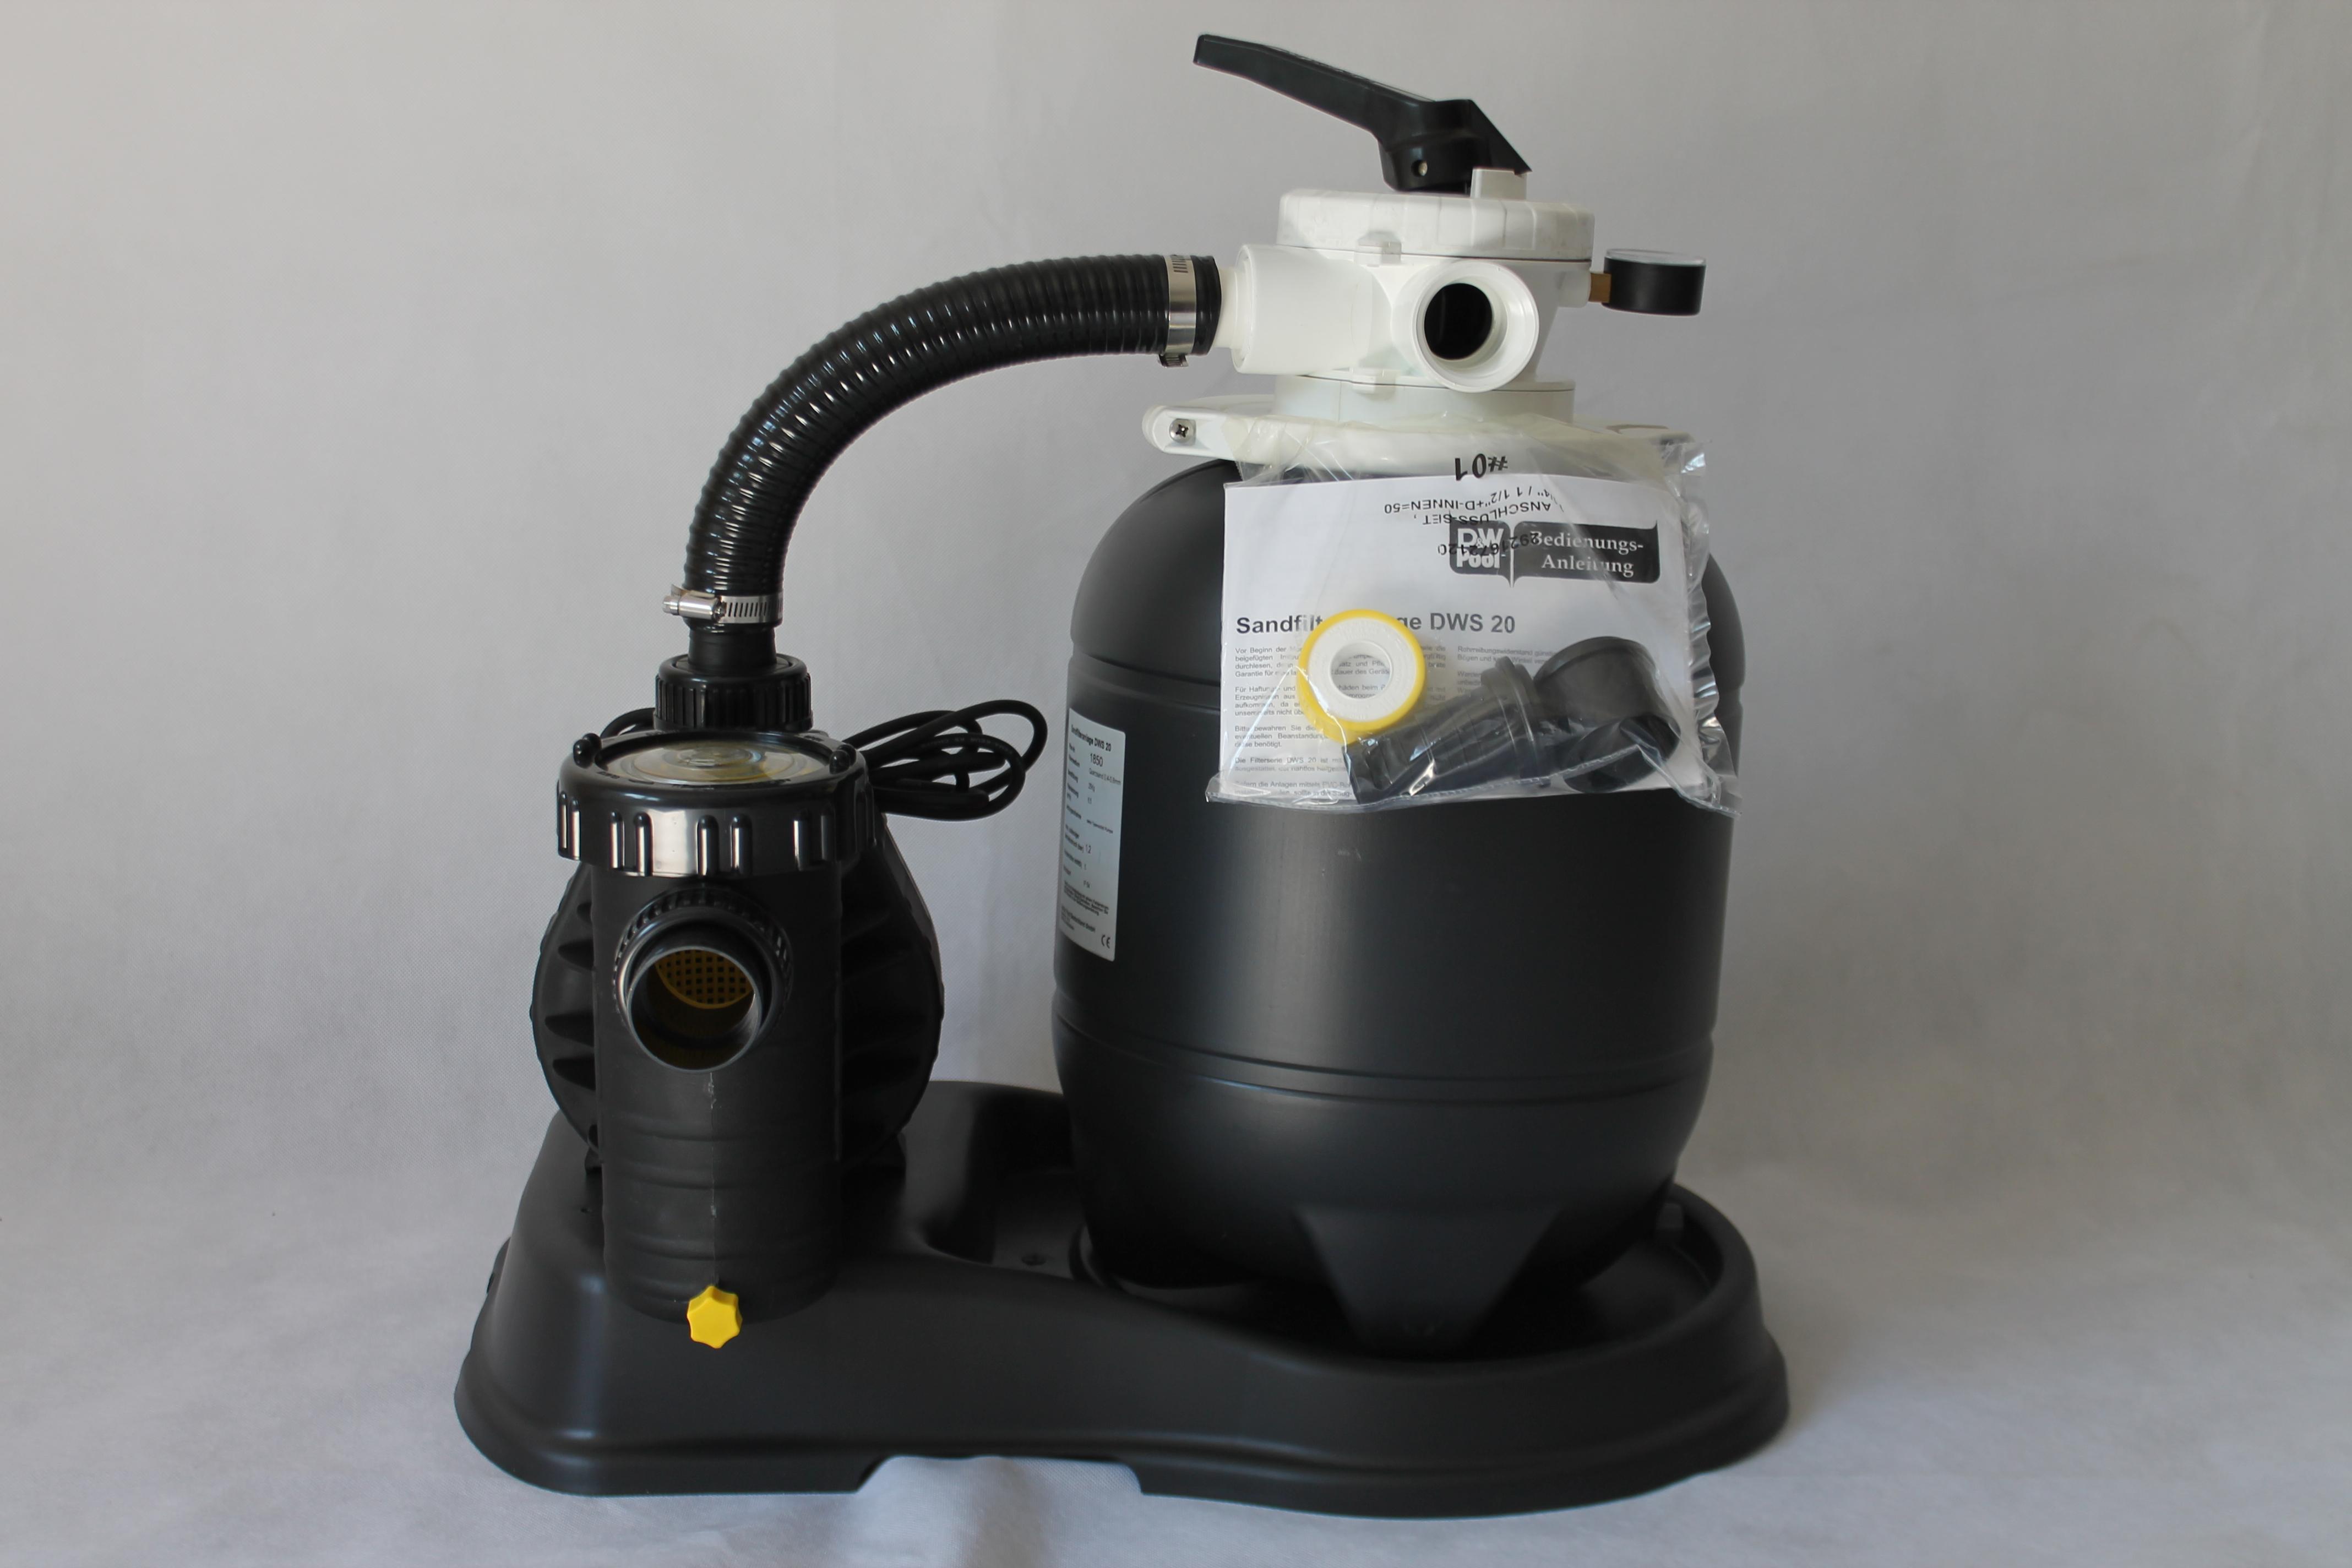 sandfilter dws 20 filteranlage schwimmbad pumpe pool bis. Black Bedroom Furniture Sets. Home Design Ideas